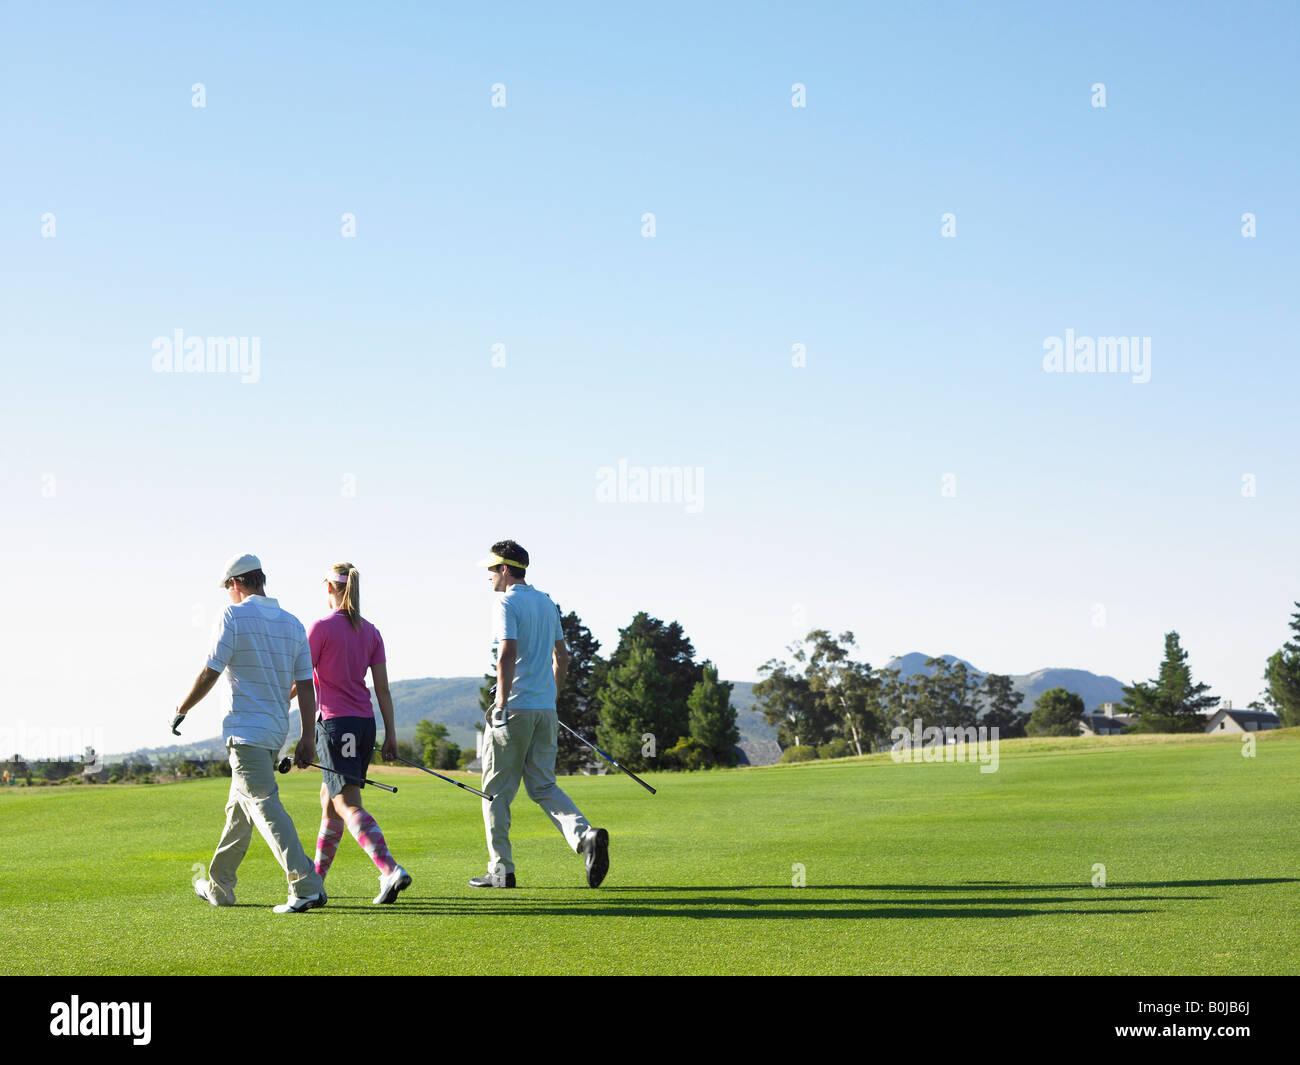 Three Golfers on Course - Stock Image